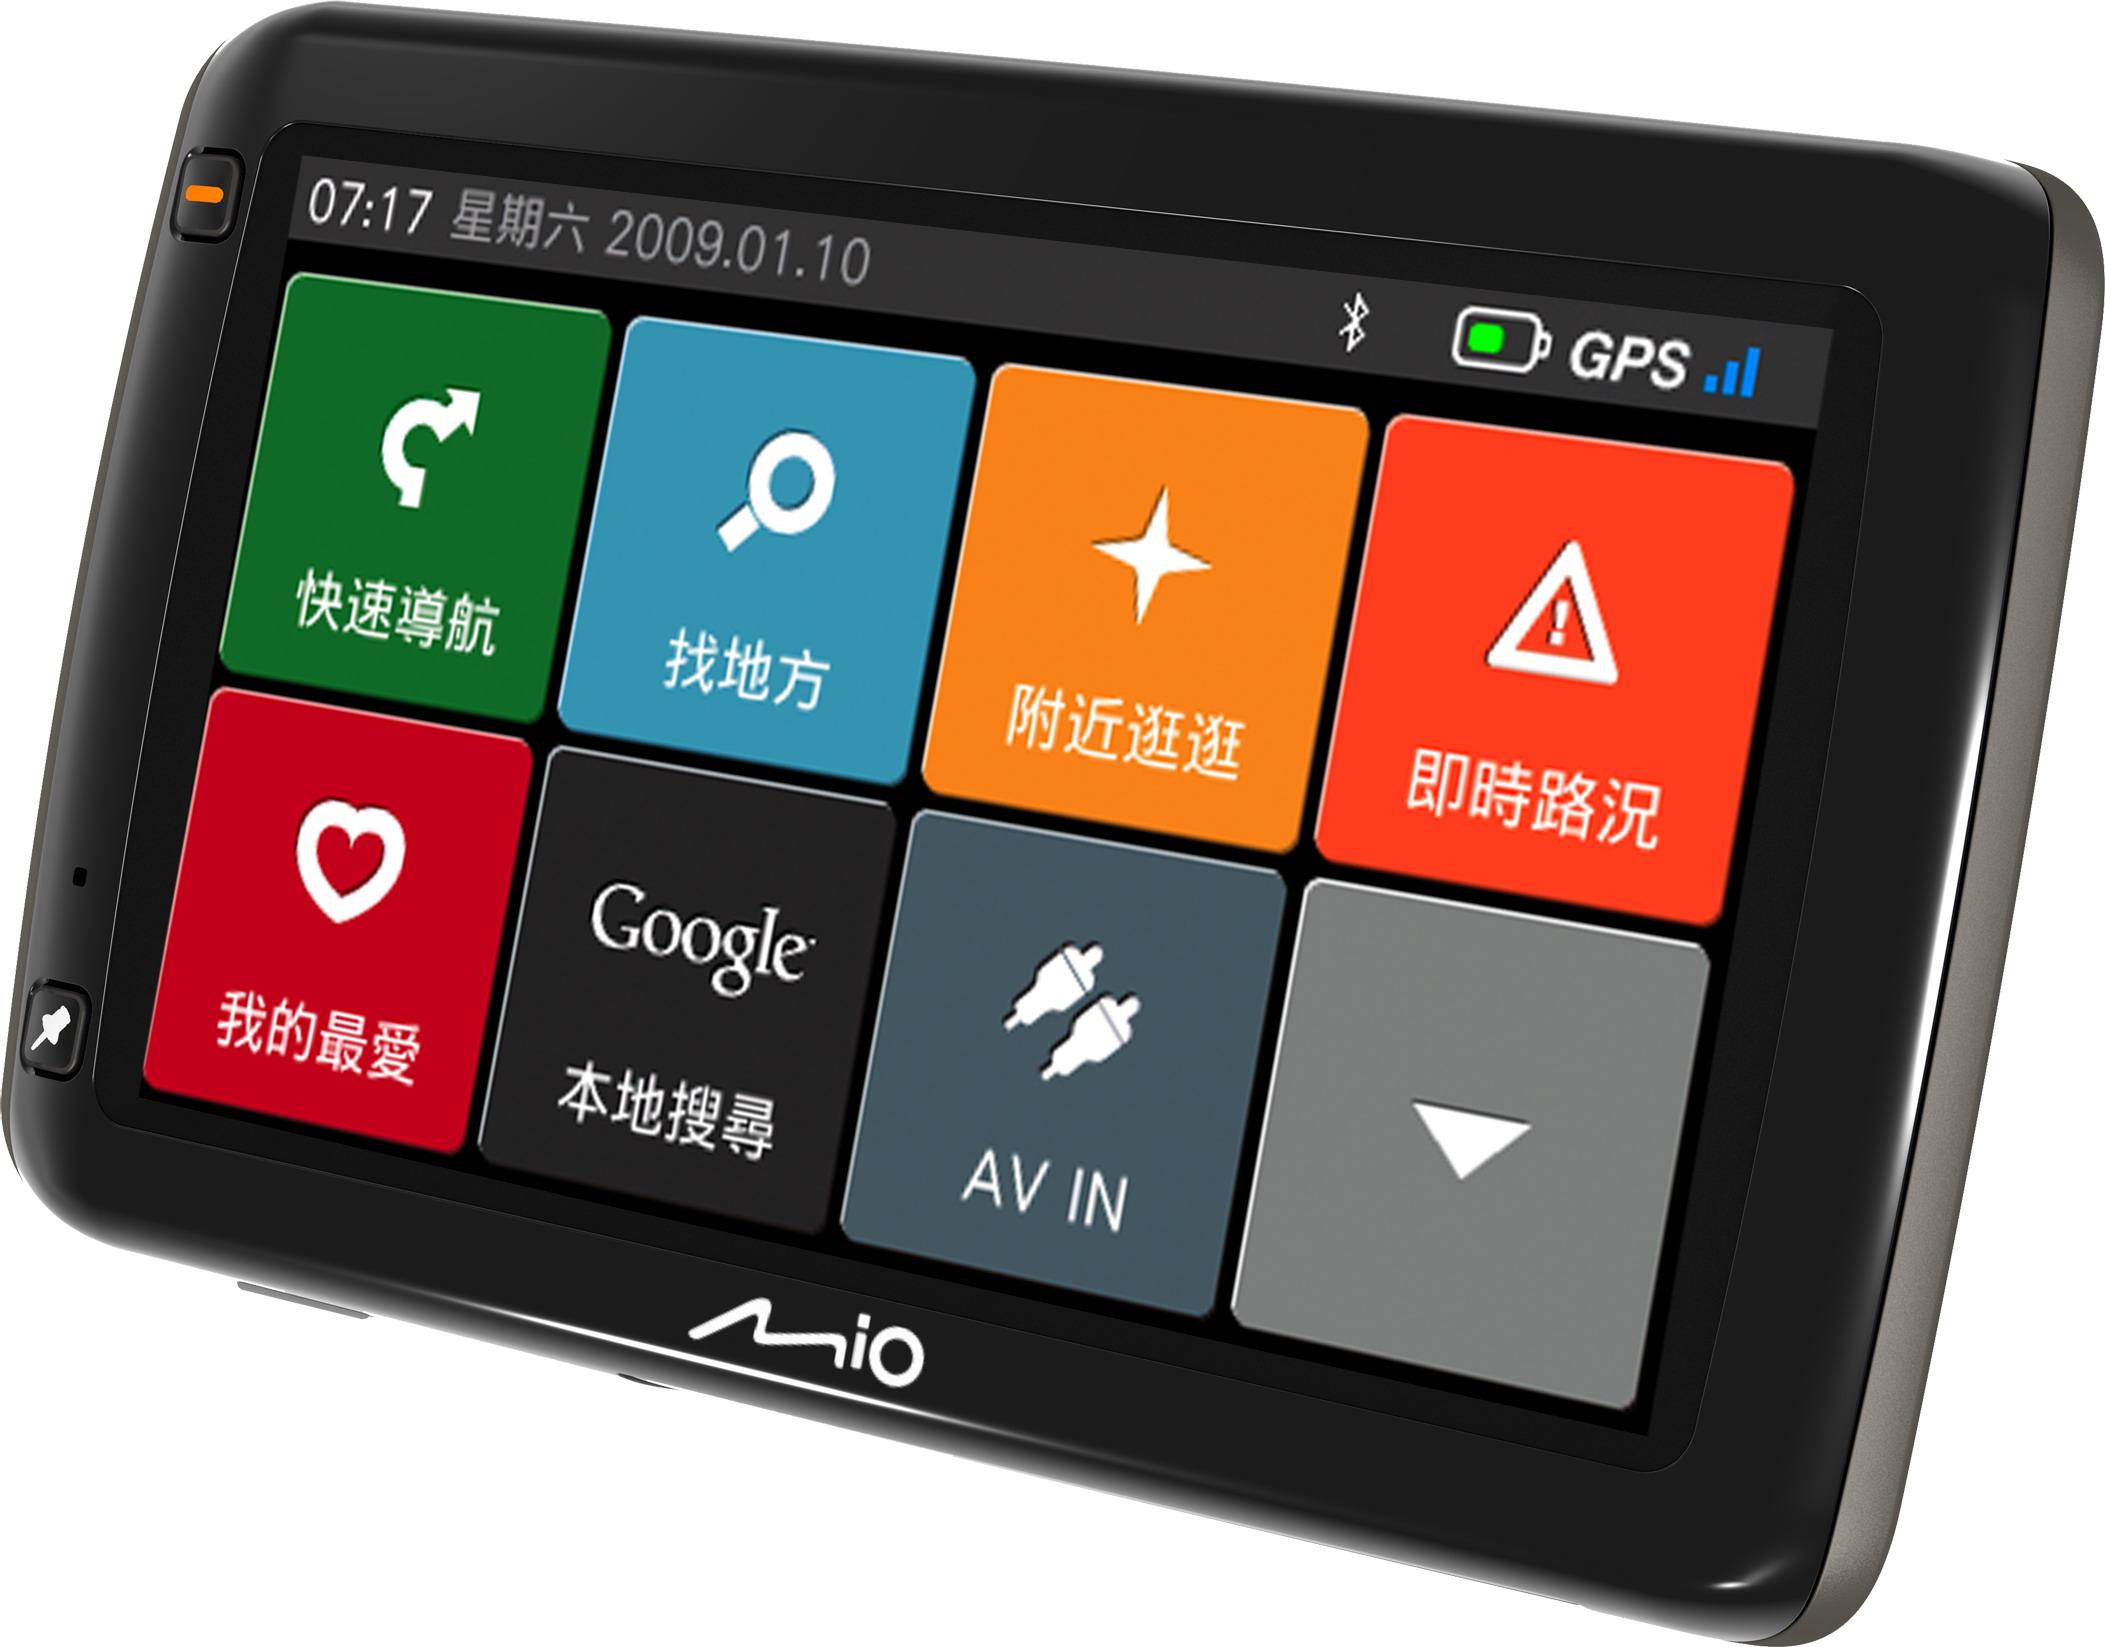 S655貼心聲控導航 簡易安全大大加分.jpg